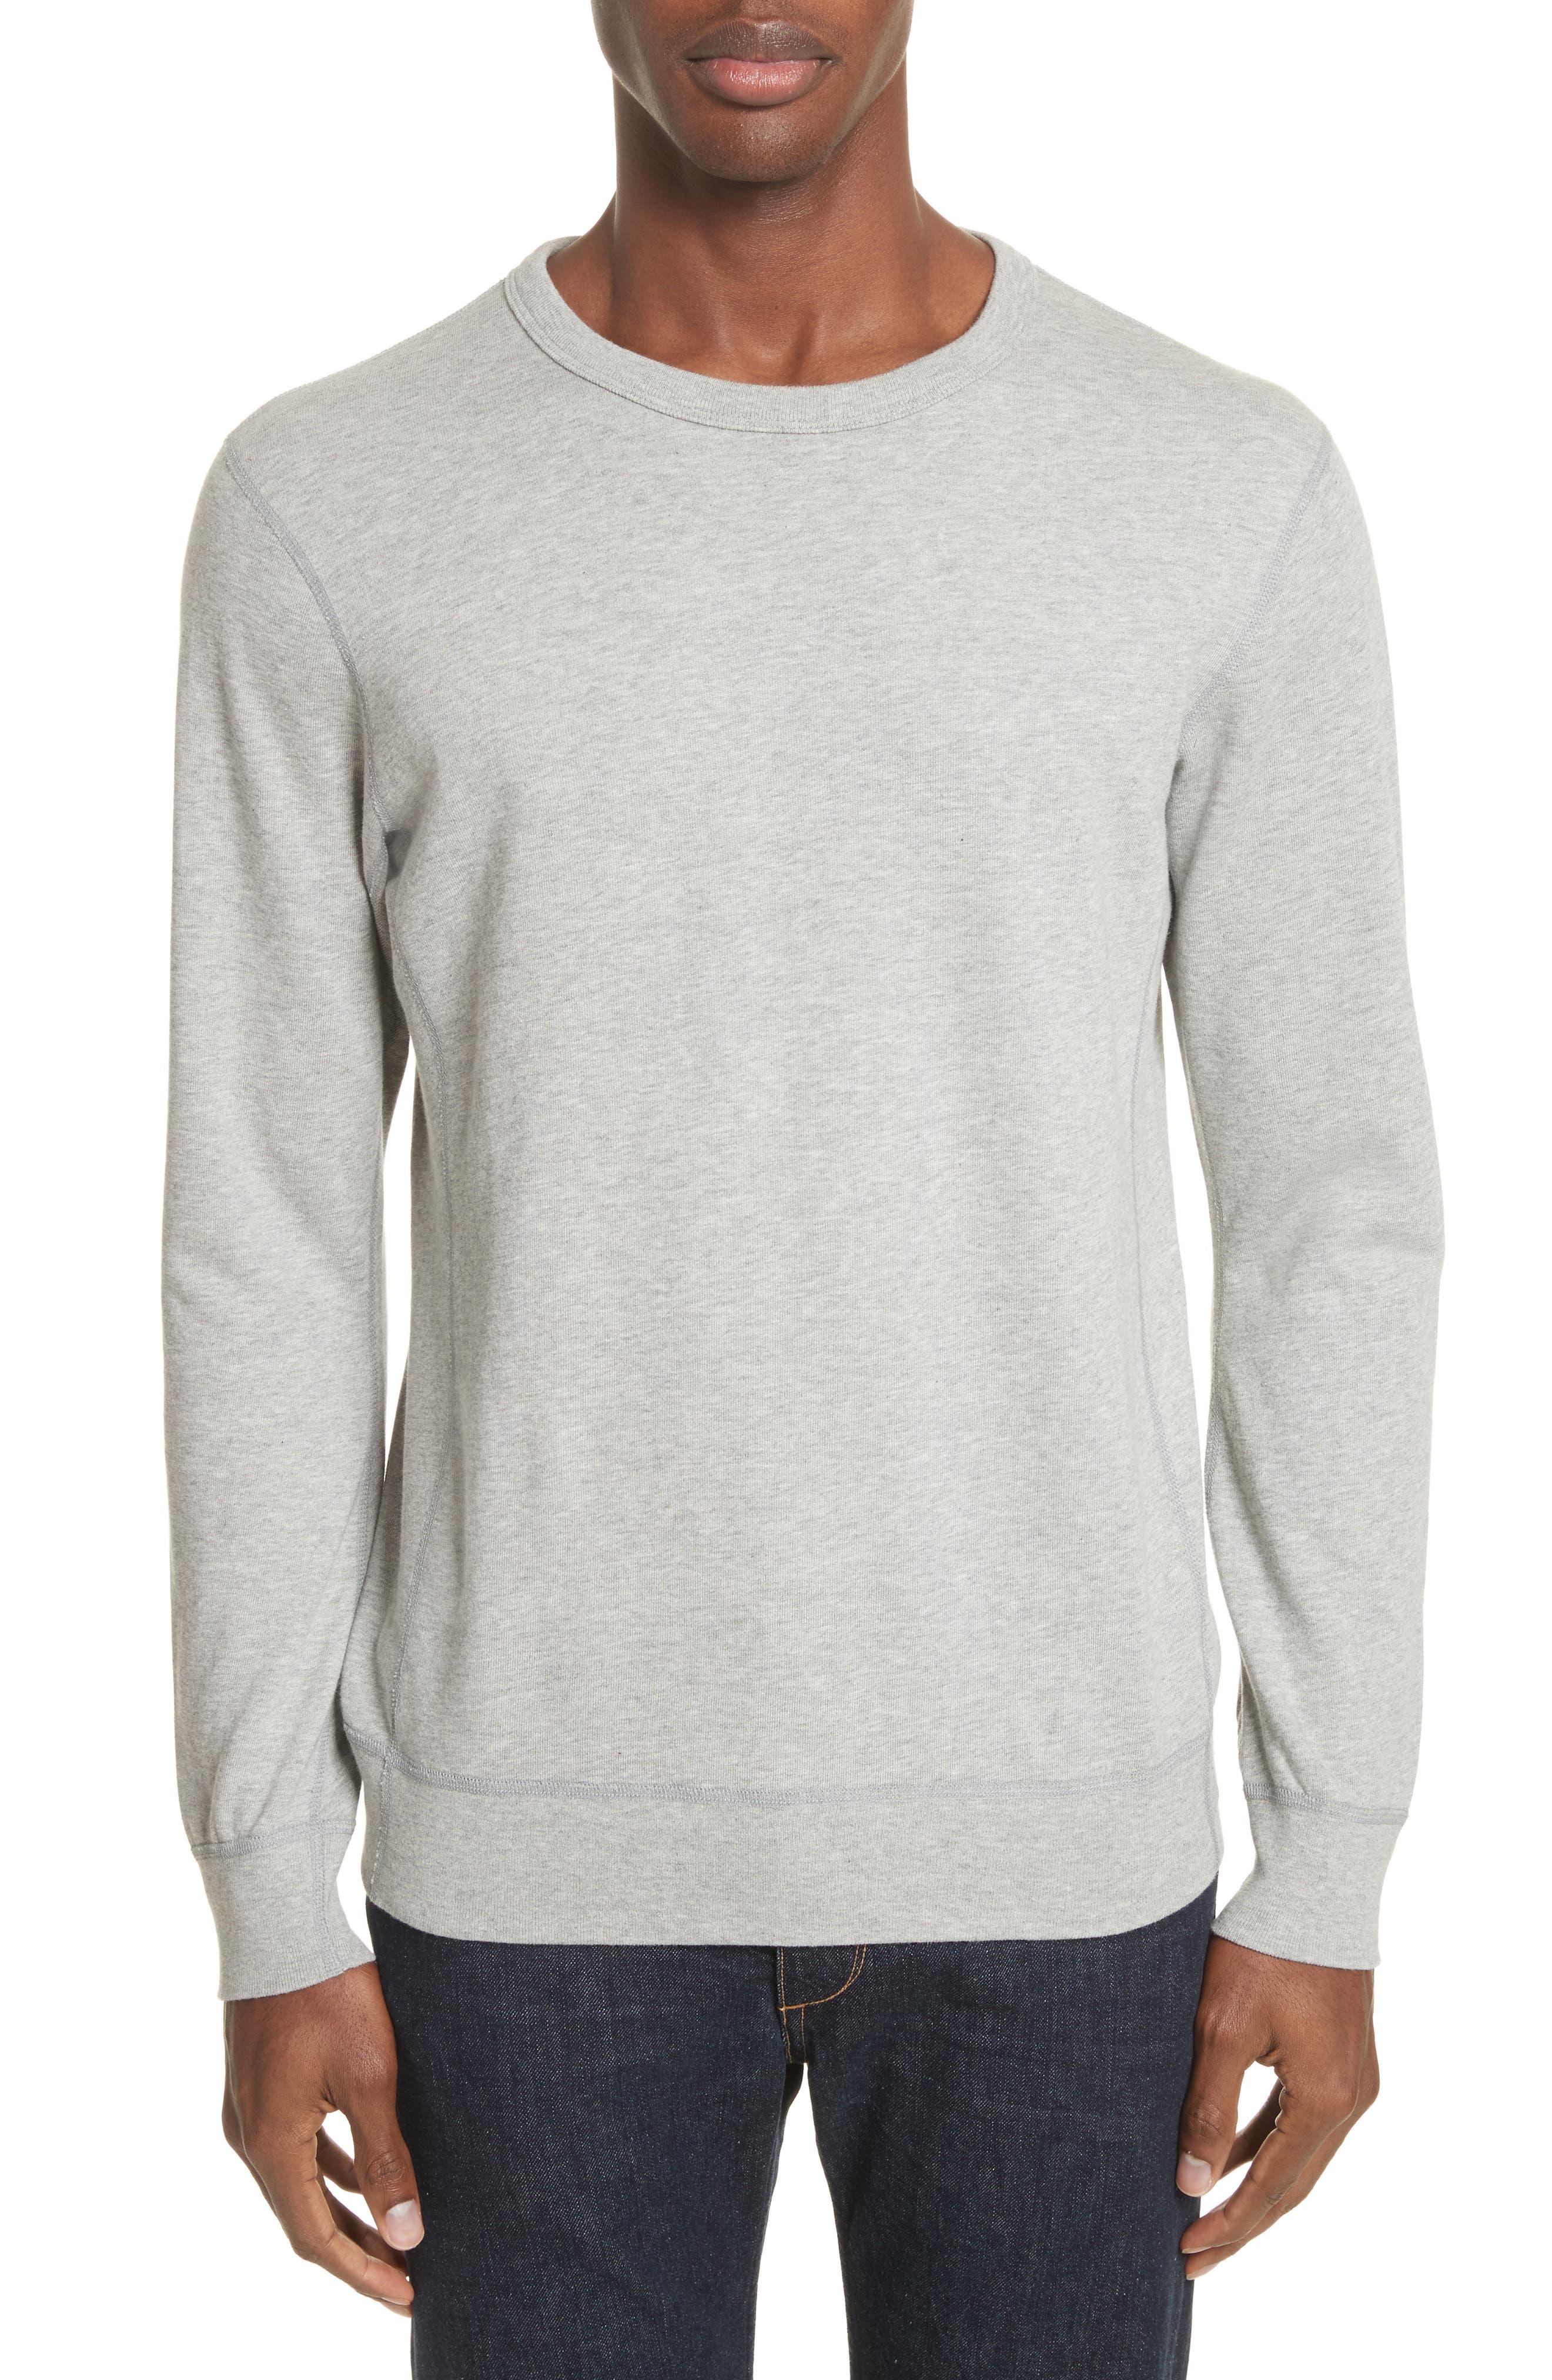 Crewneck Sweatshirt,                             Main thumbnail 1, color,                             060